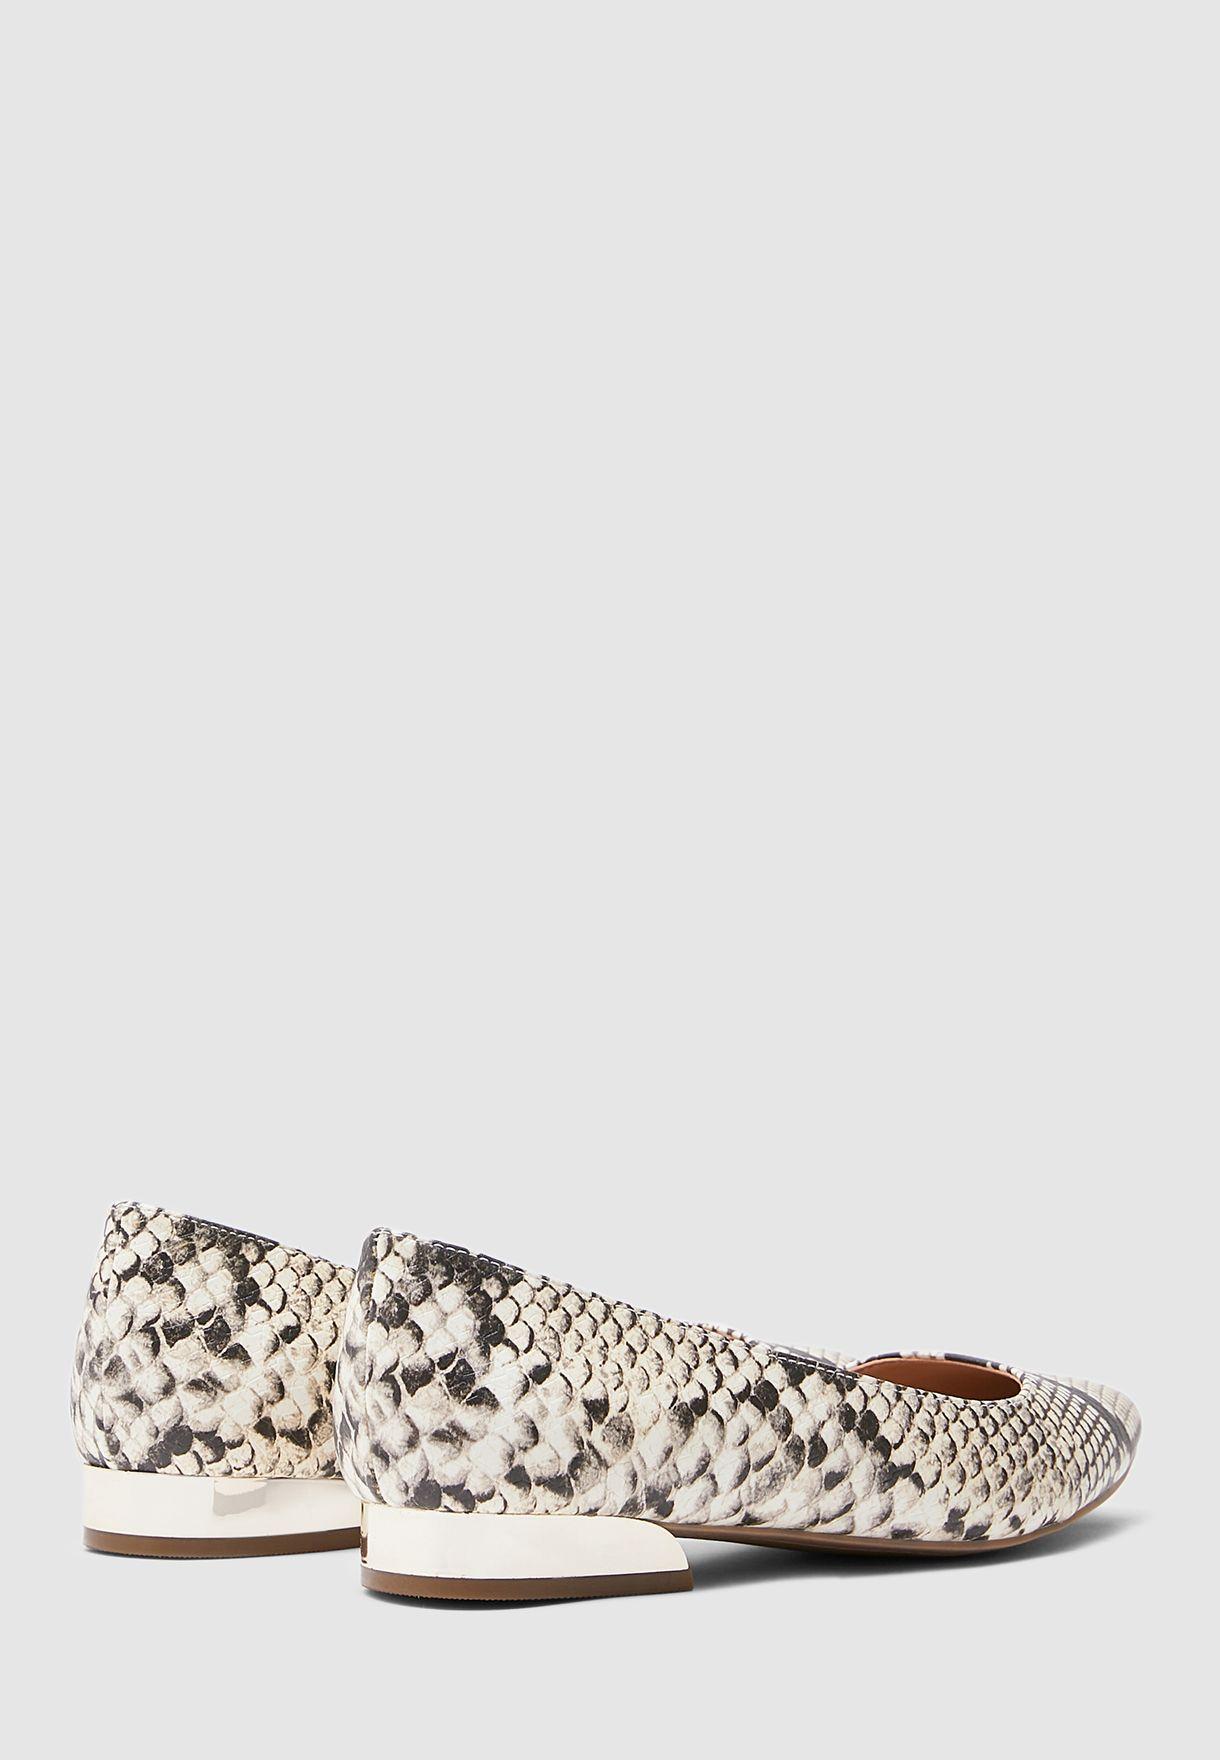 Call It Spring Ankai Ballerina - Brand Shoes